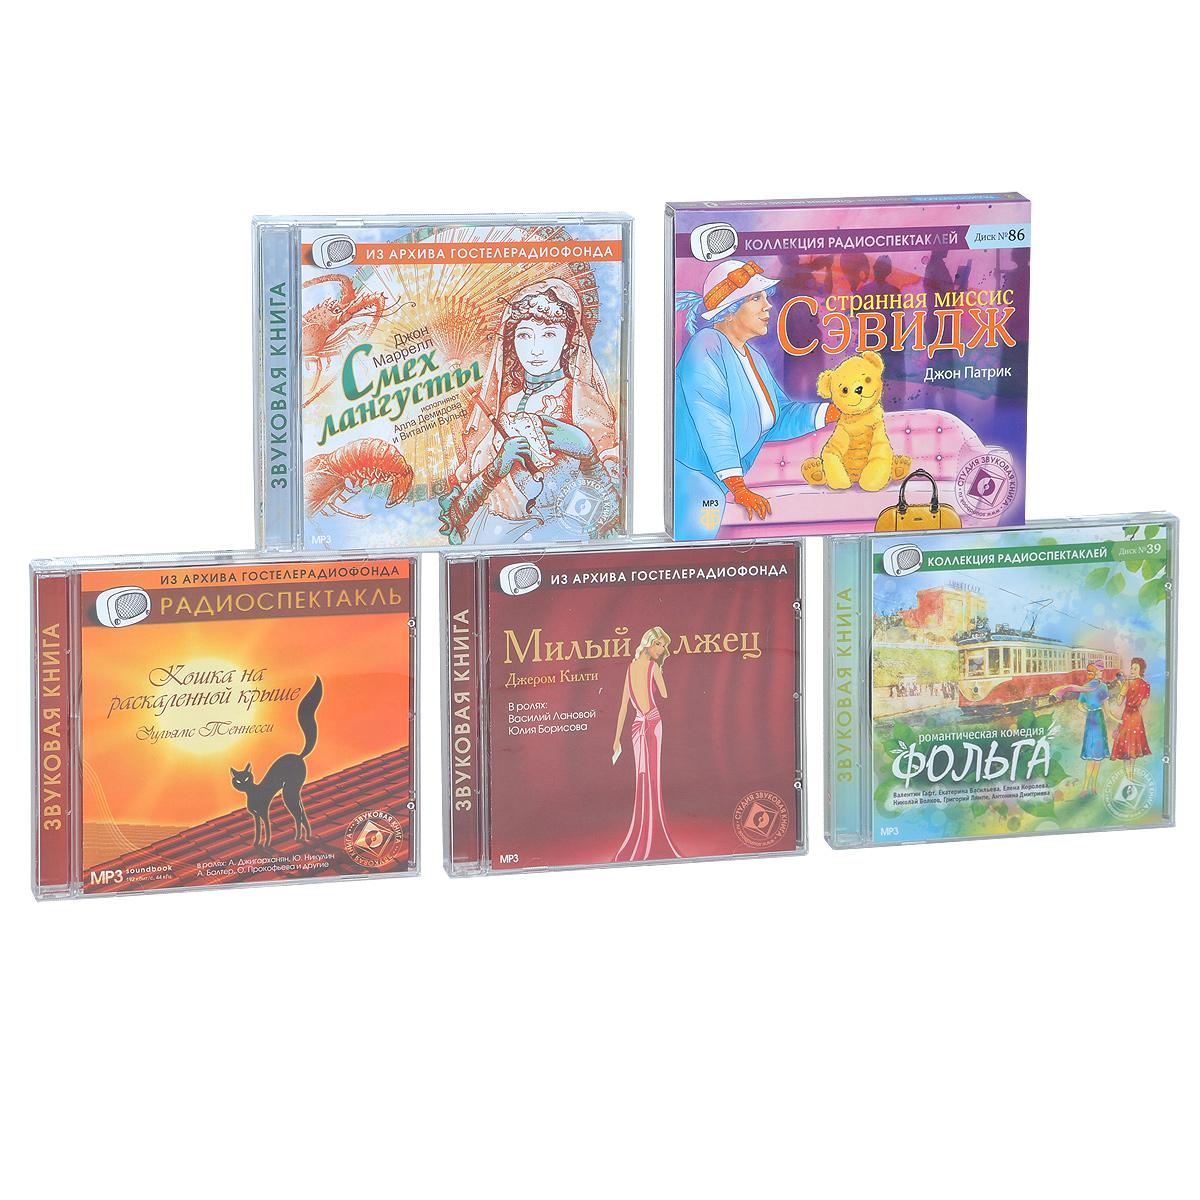 Женский сборник (комплект из 5 аудиокниг MP3)